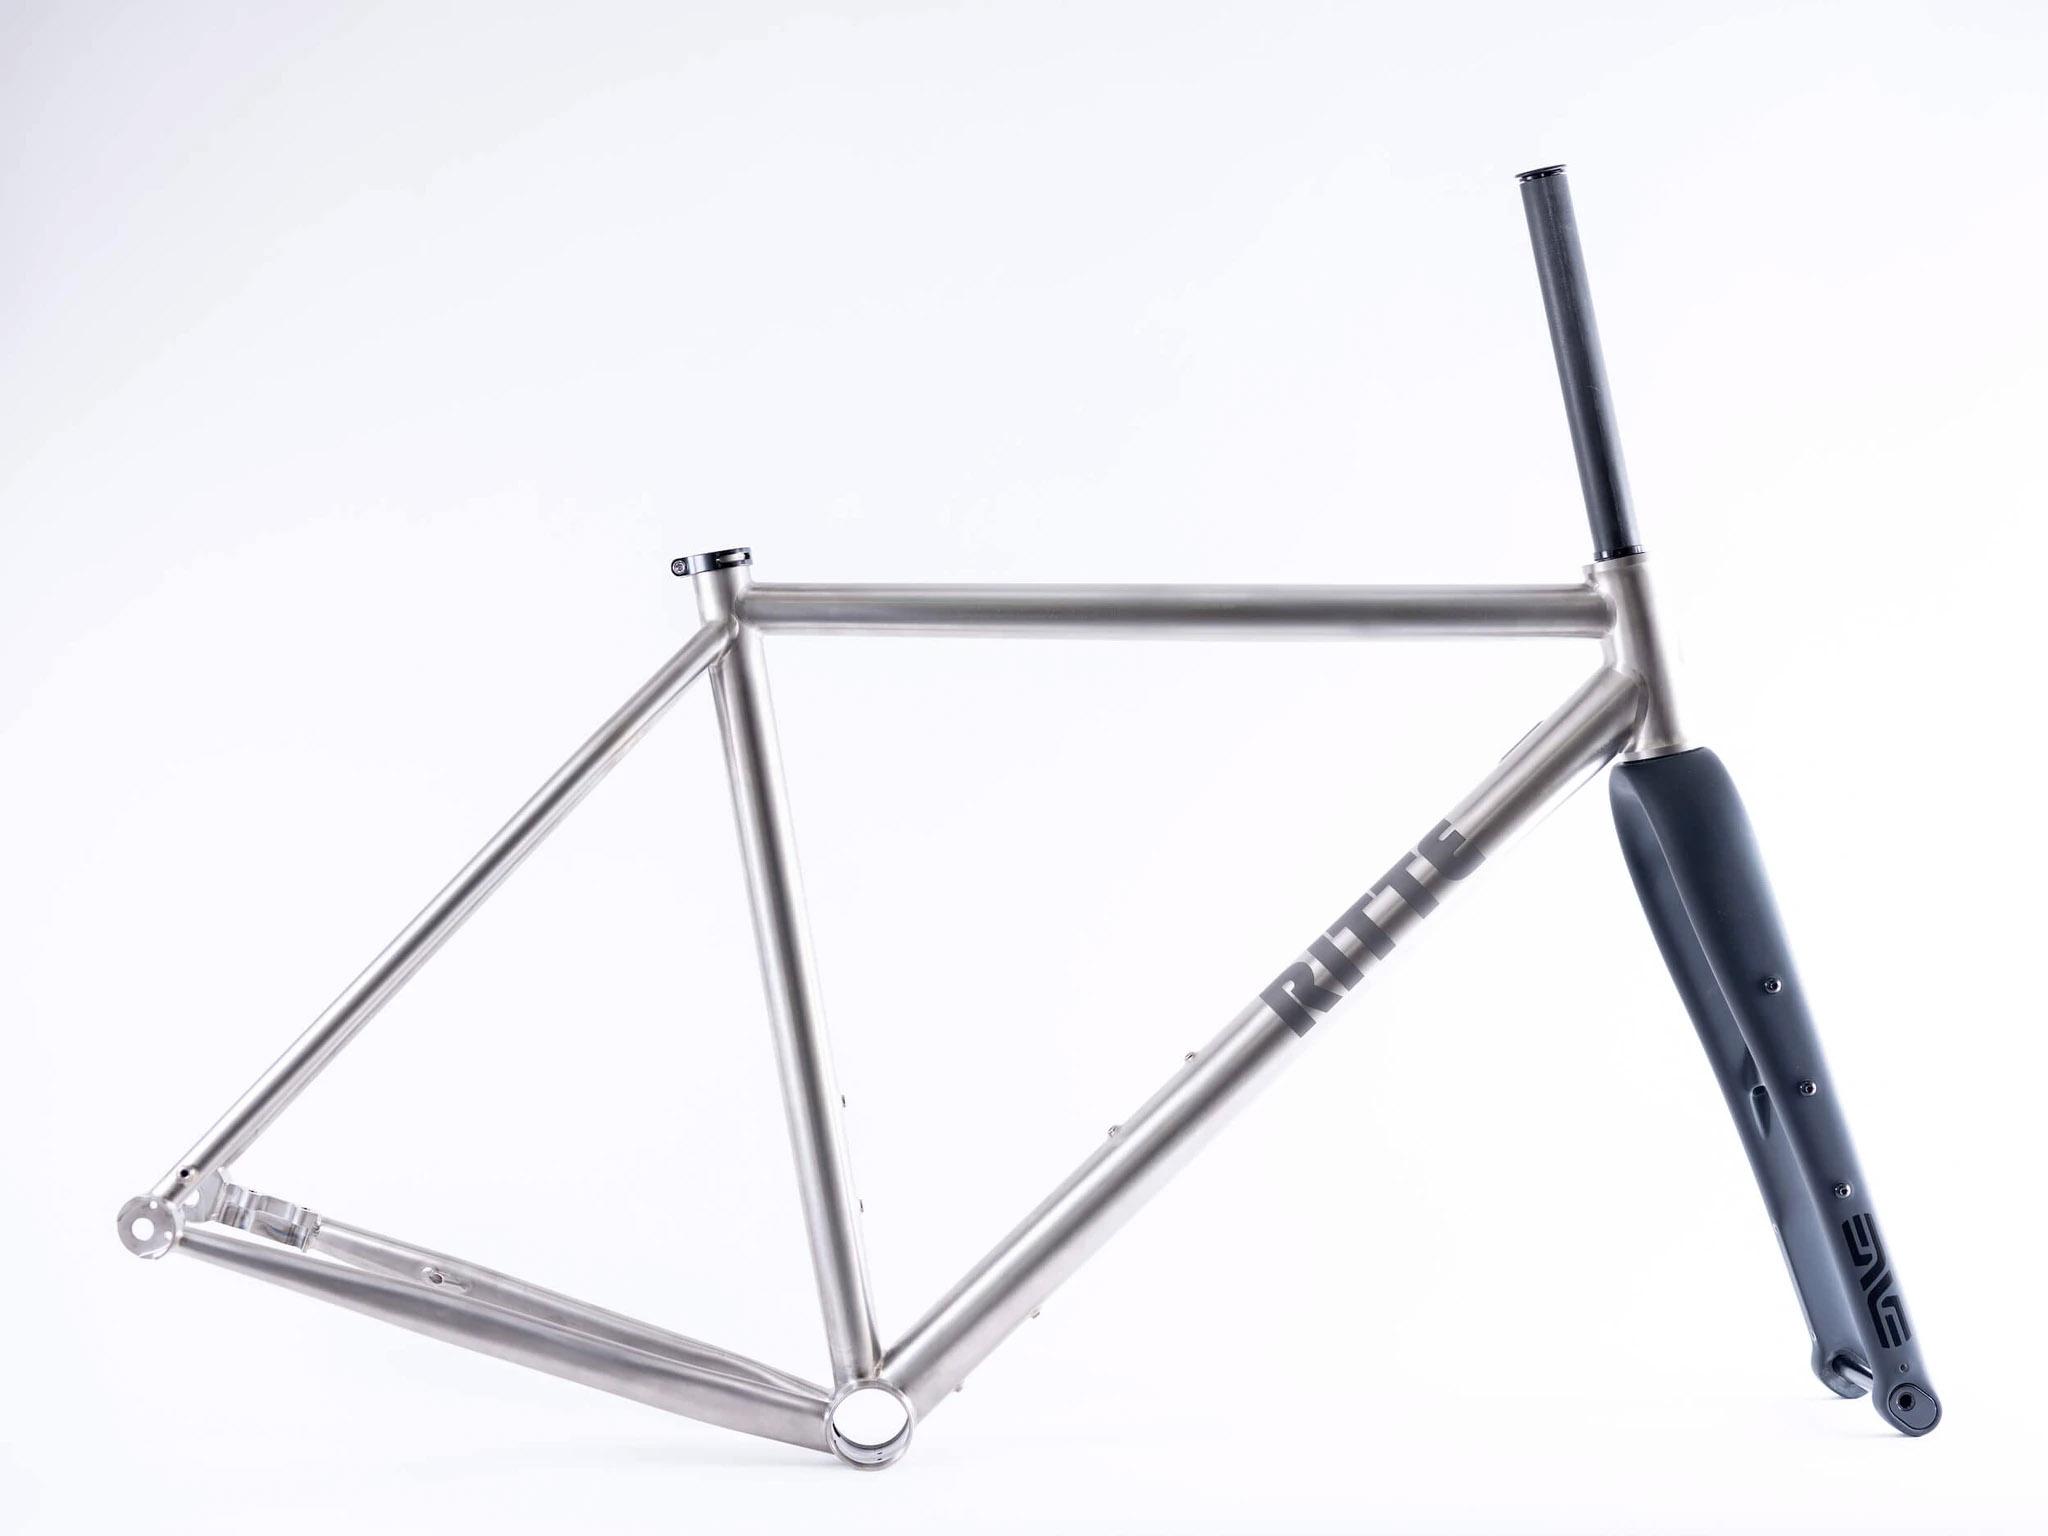 Ritte Satyr 2.0 titanium gravel frame with fork